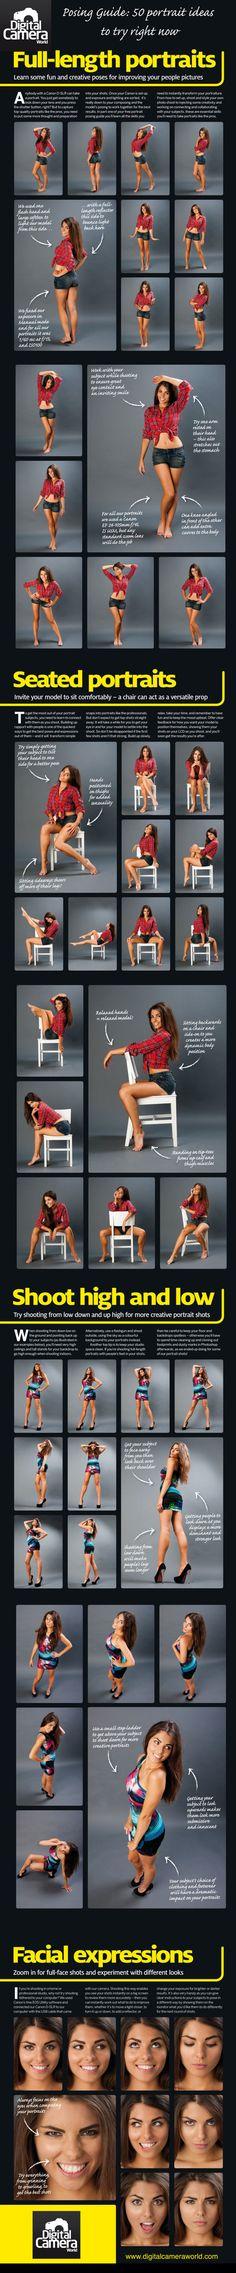 50 Portrait Photography Ideas | Infographic - UltraLinx